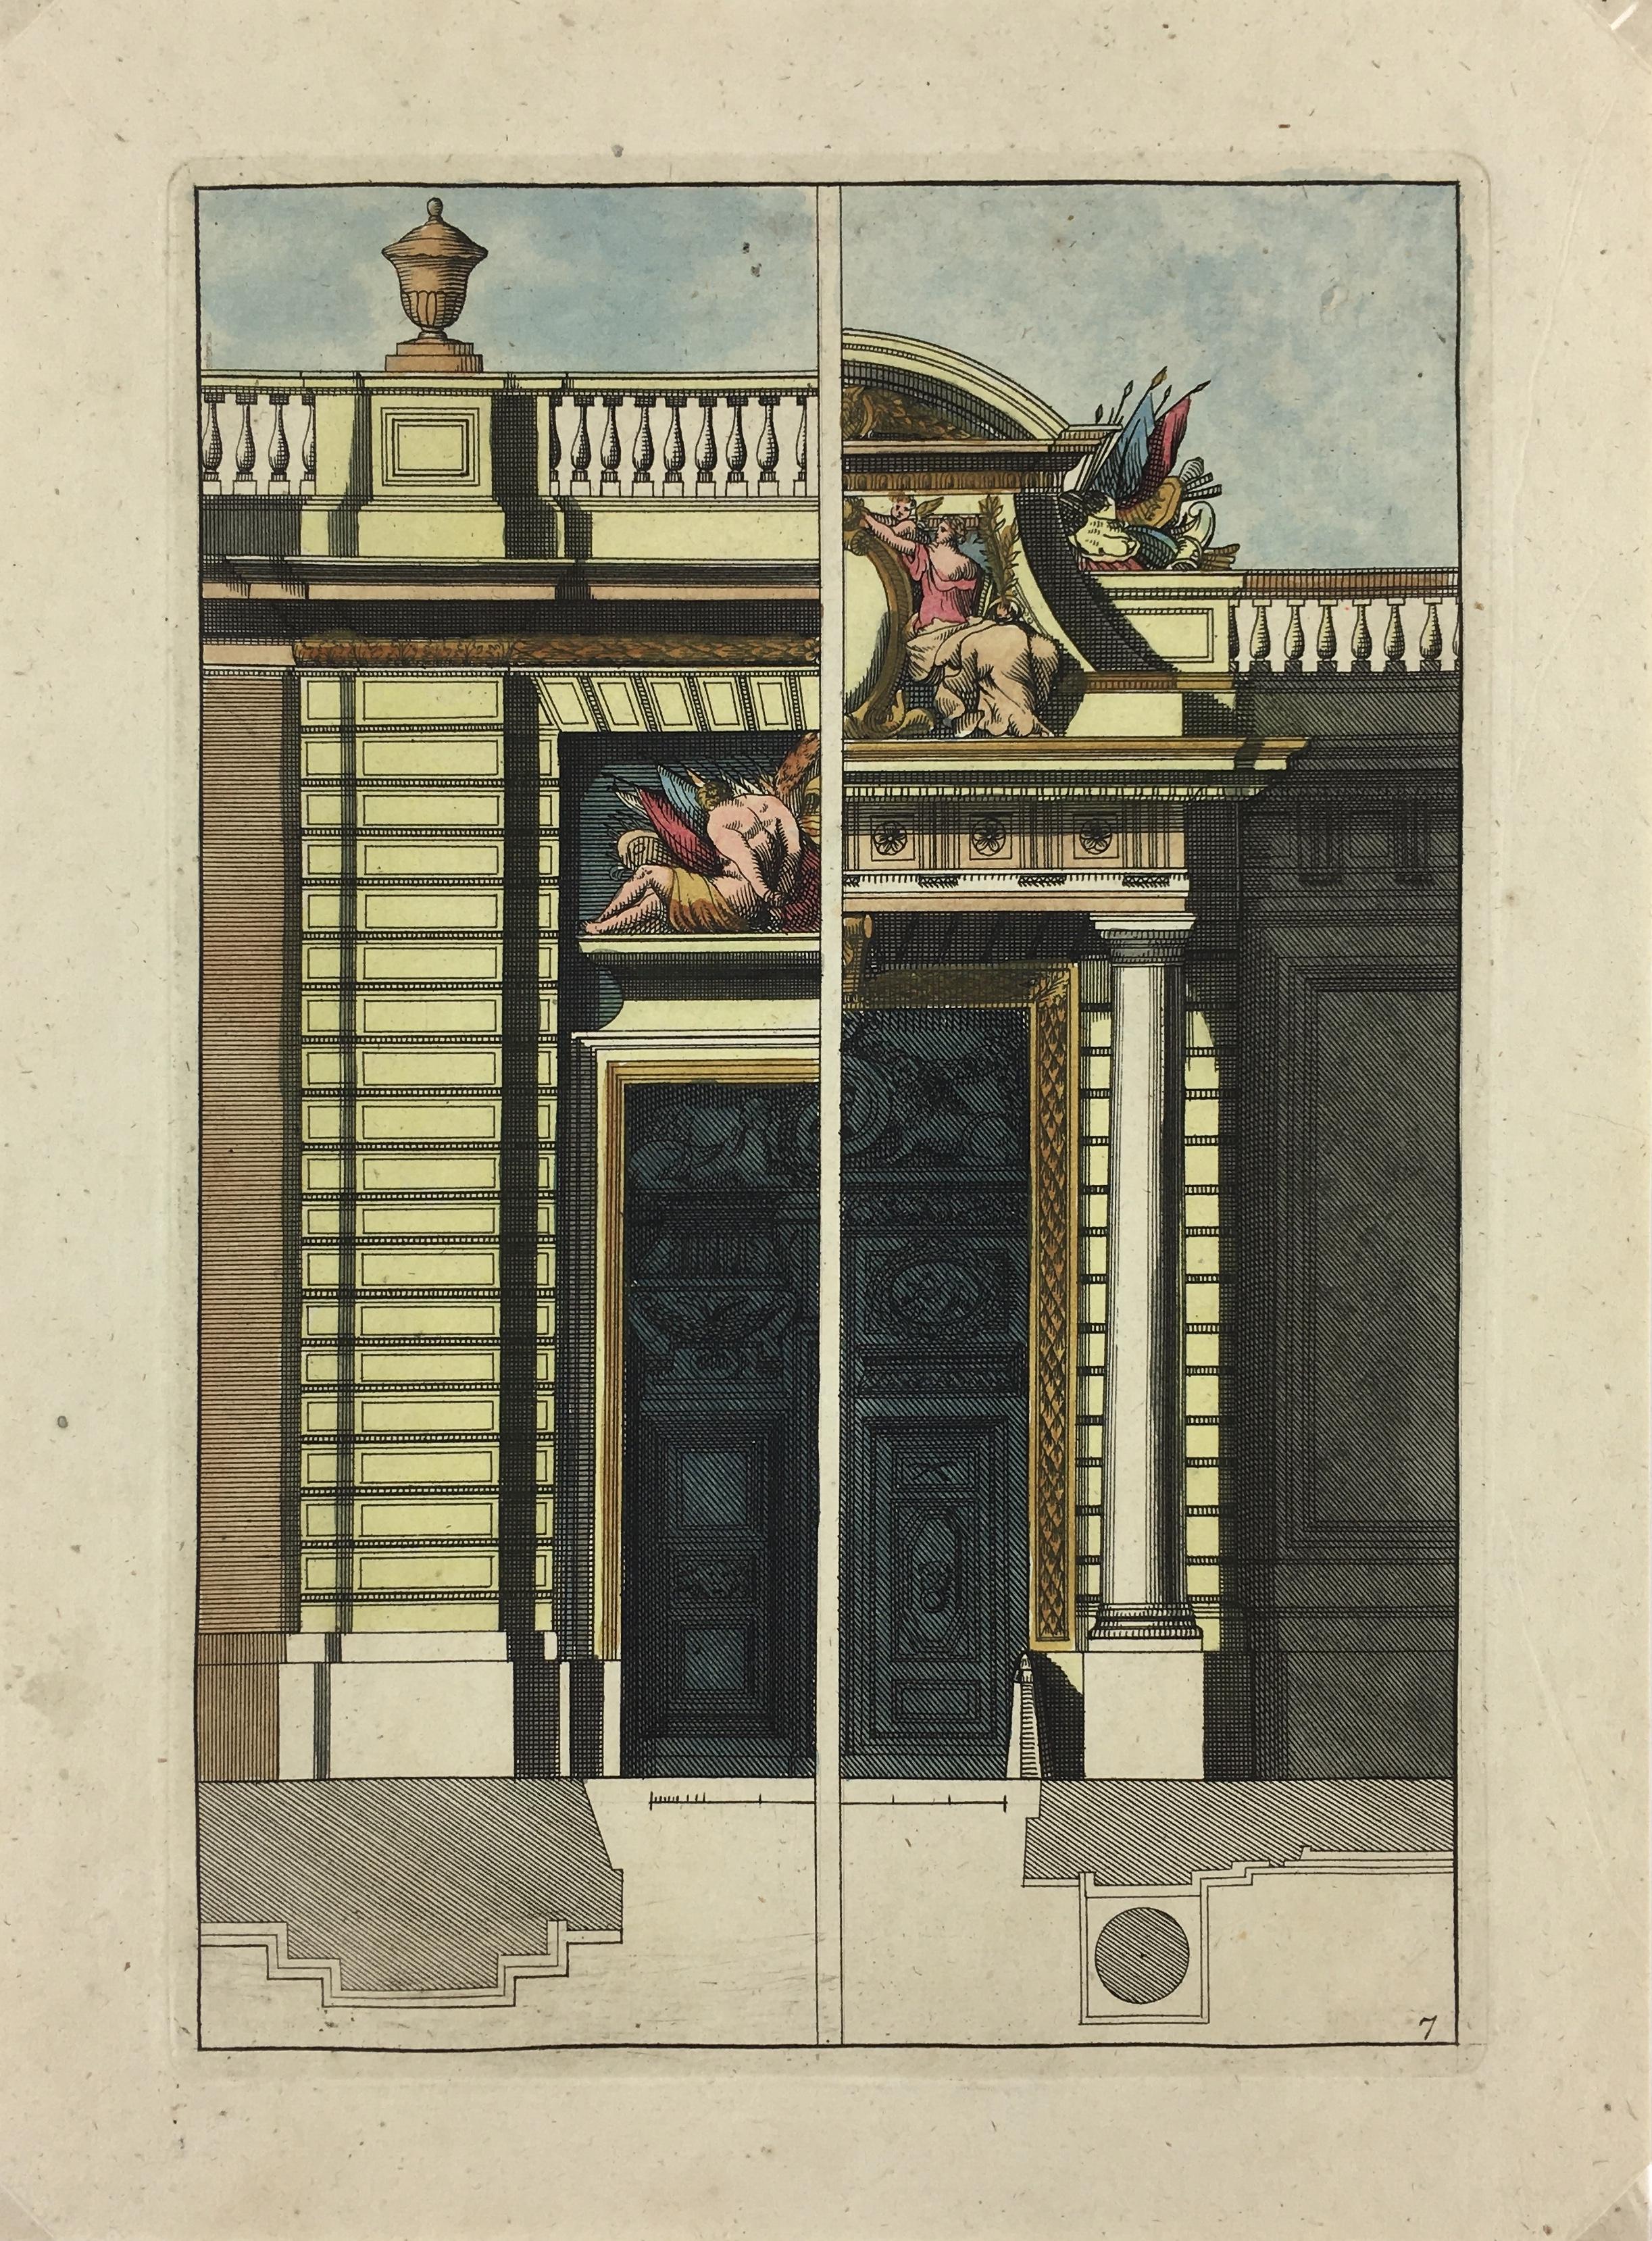 Architecture Print - Architecture, Copper Eng, c.1720